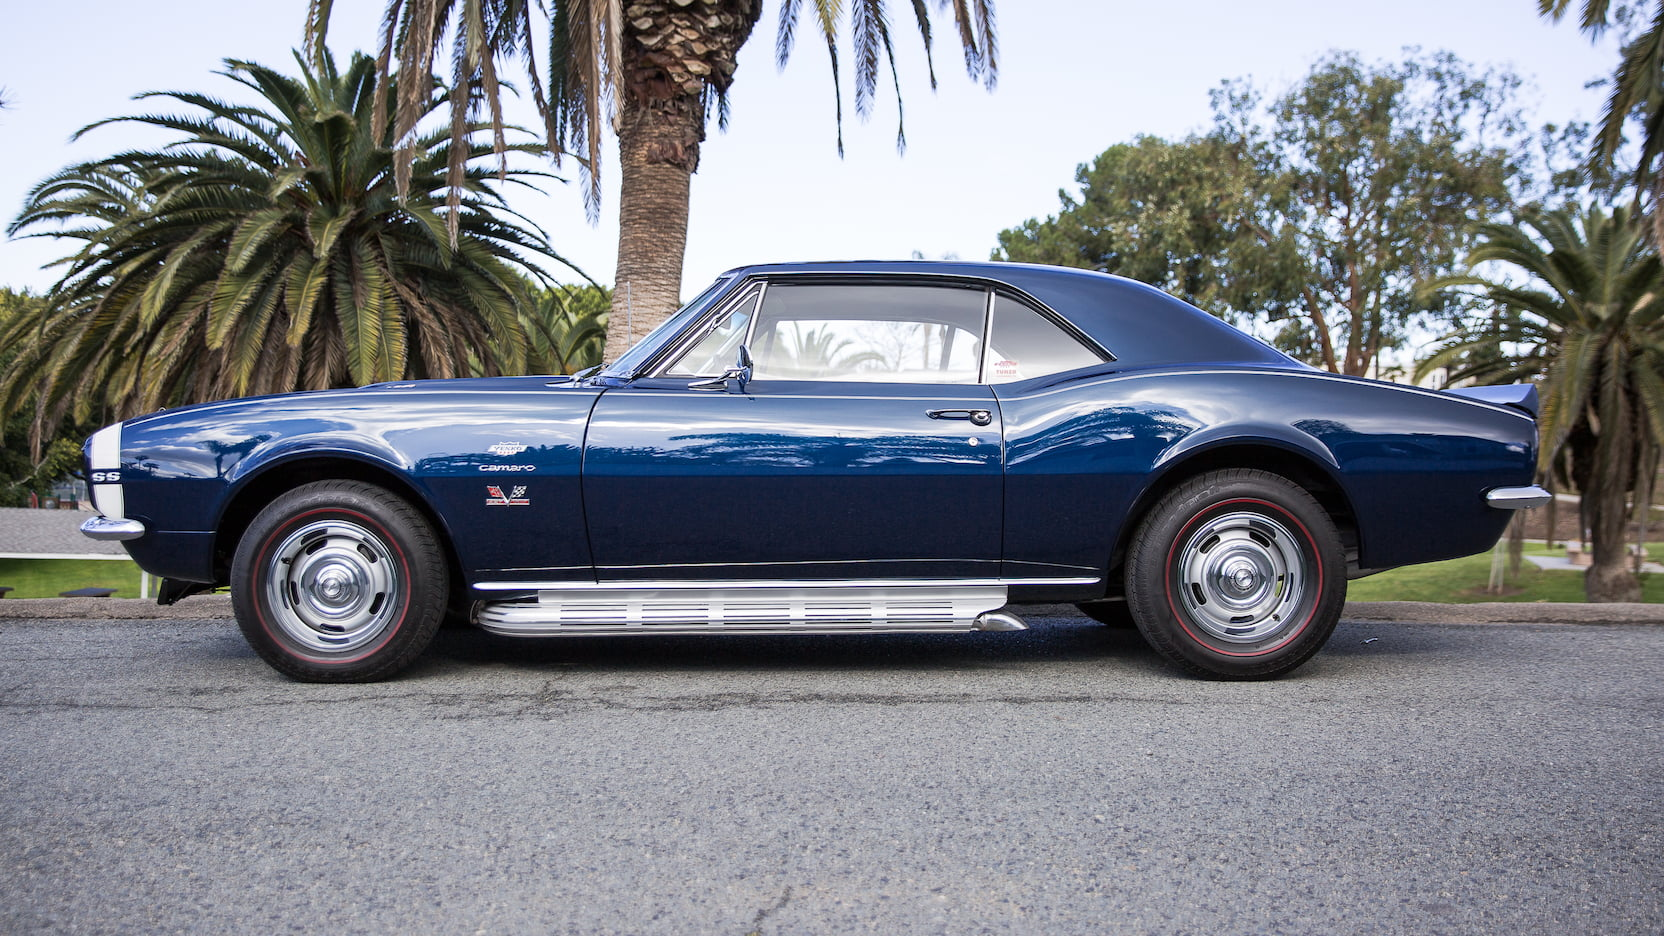 1967 Chevrolet Yenko Camaro side profile